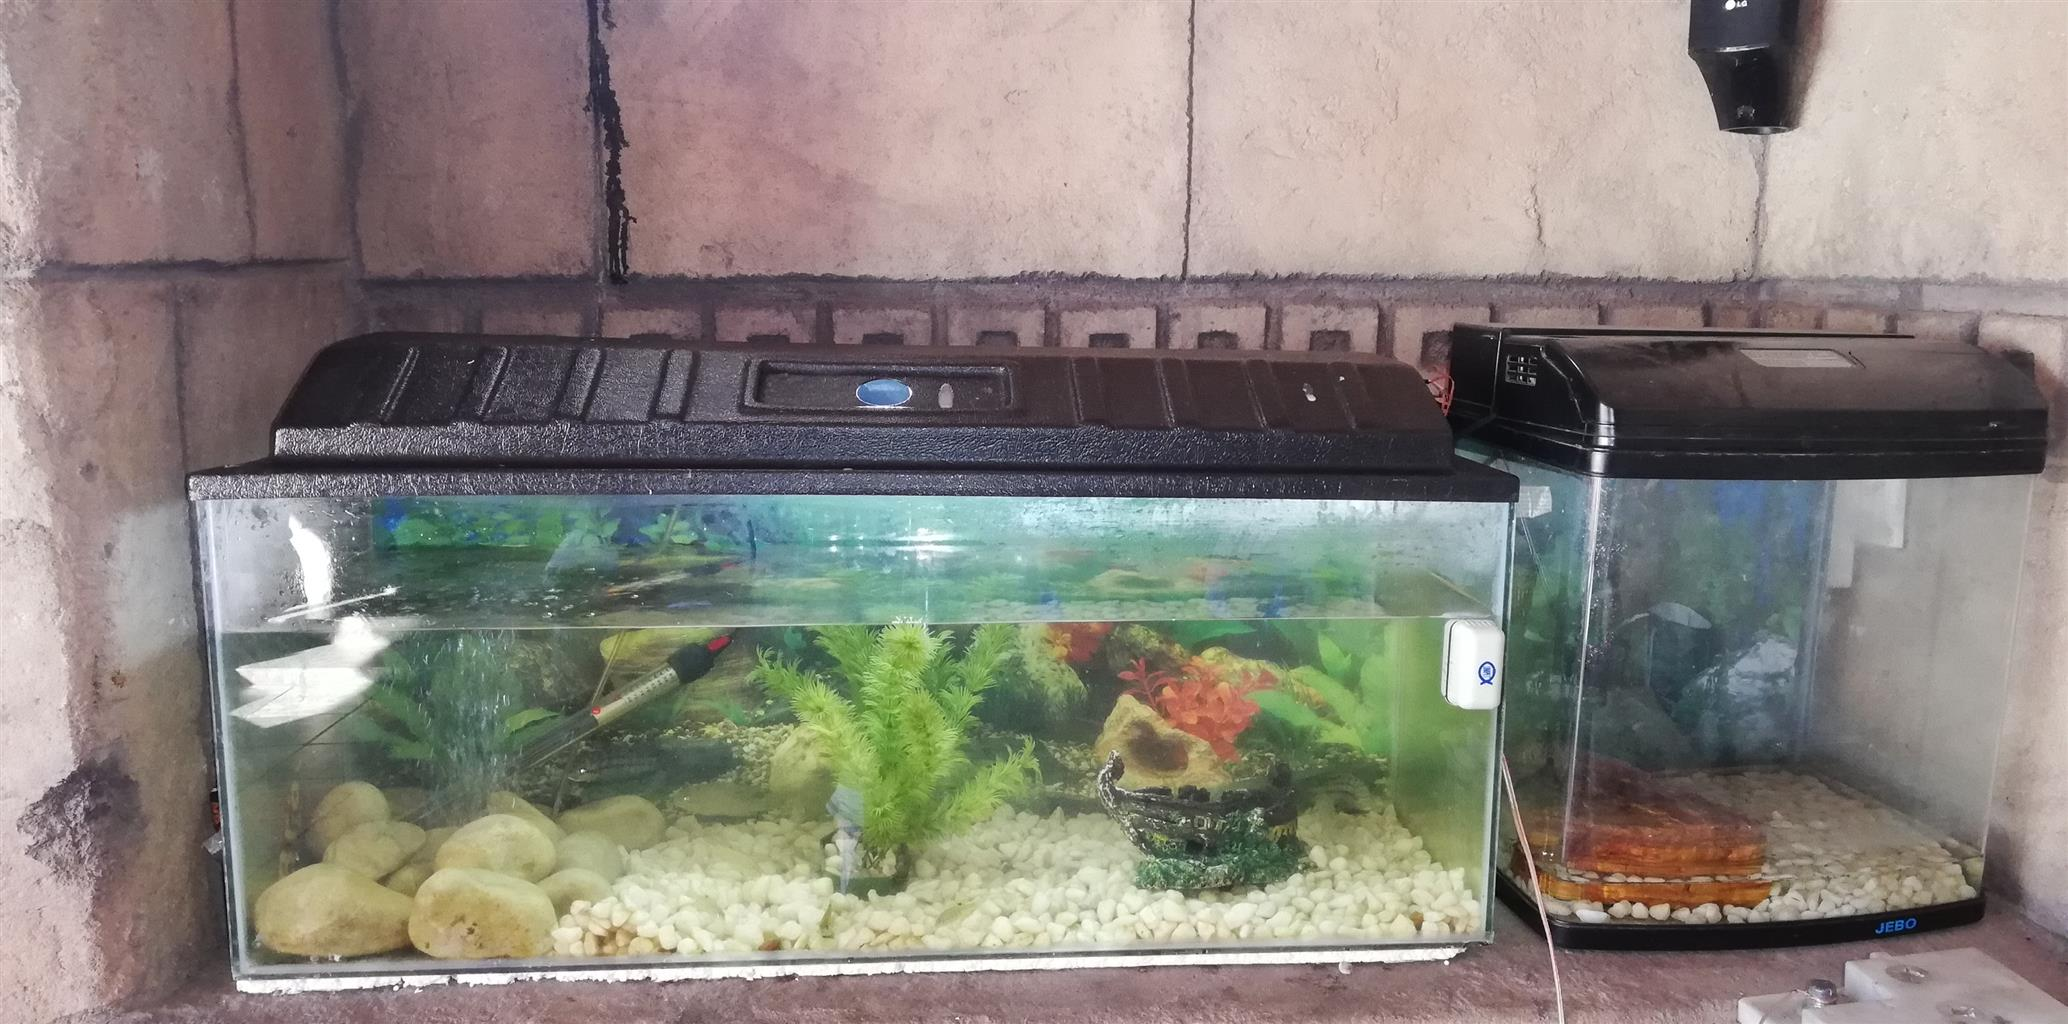 900mm Fish tank